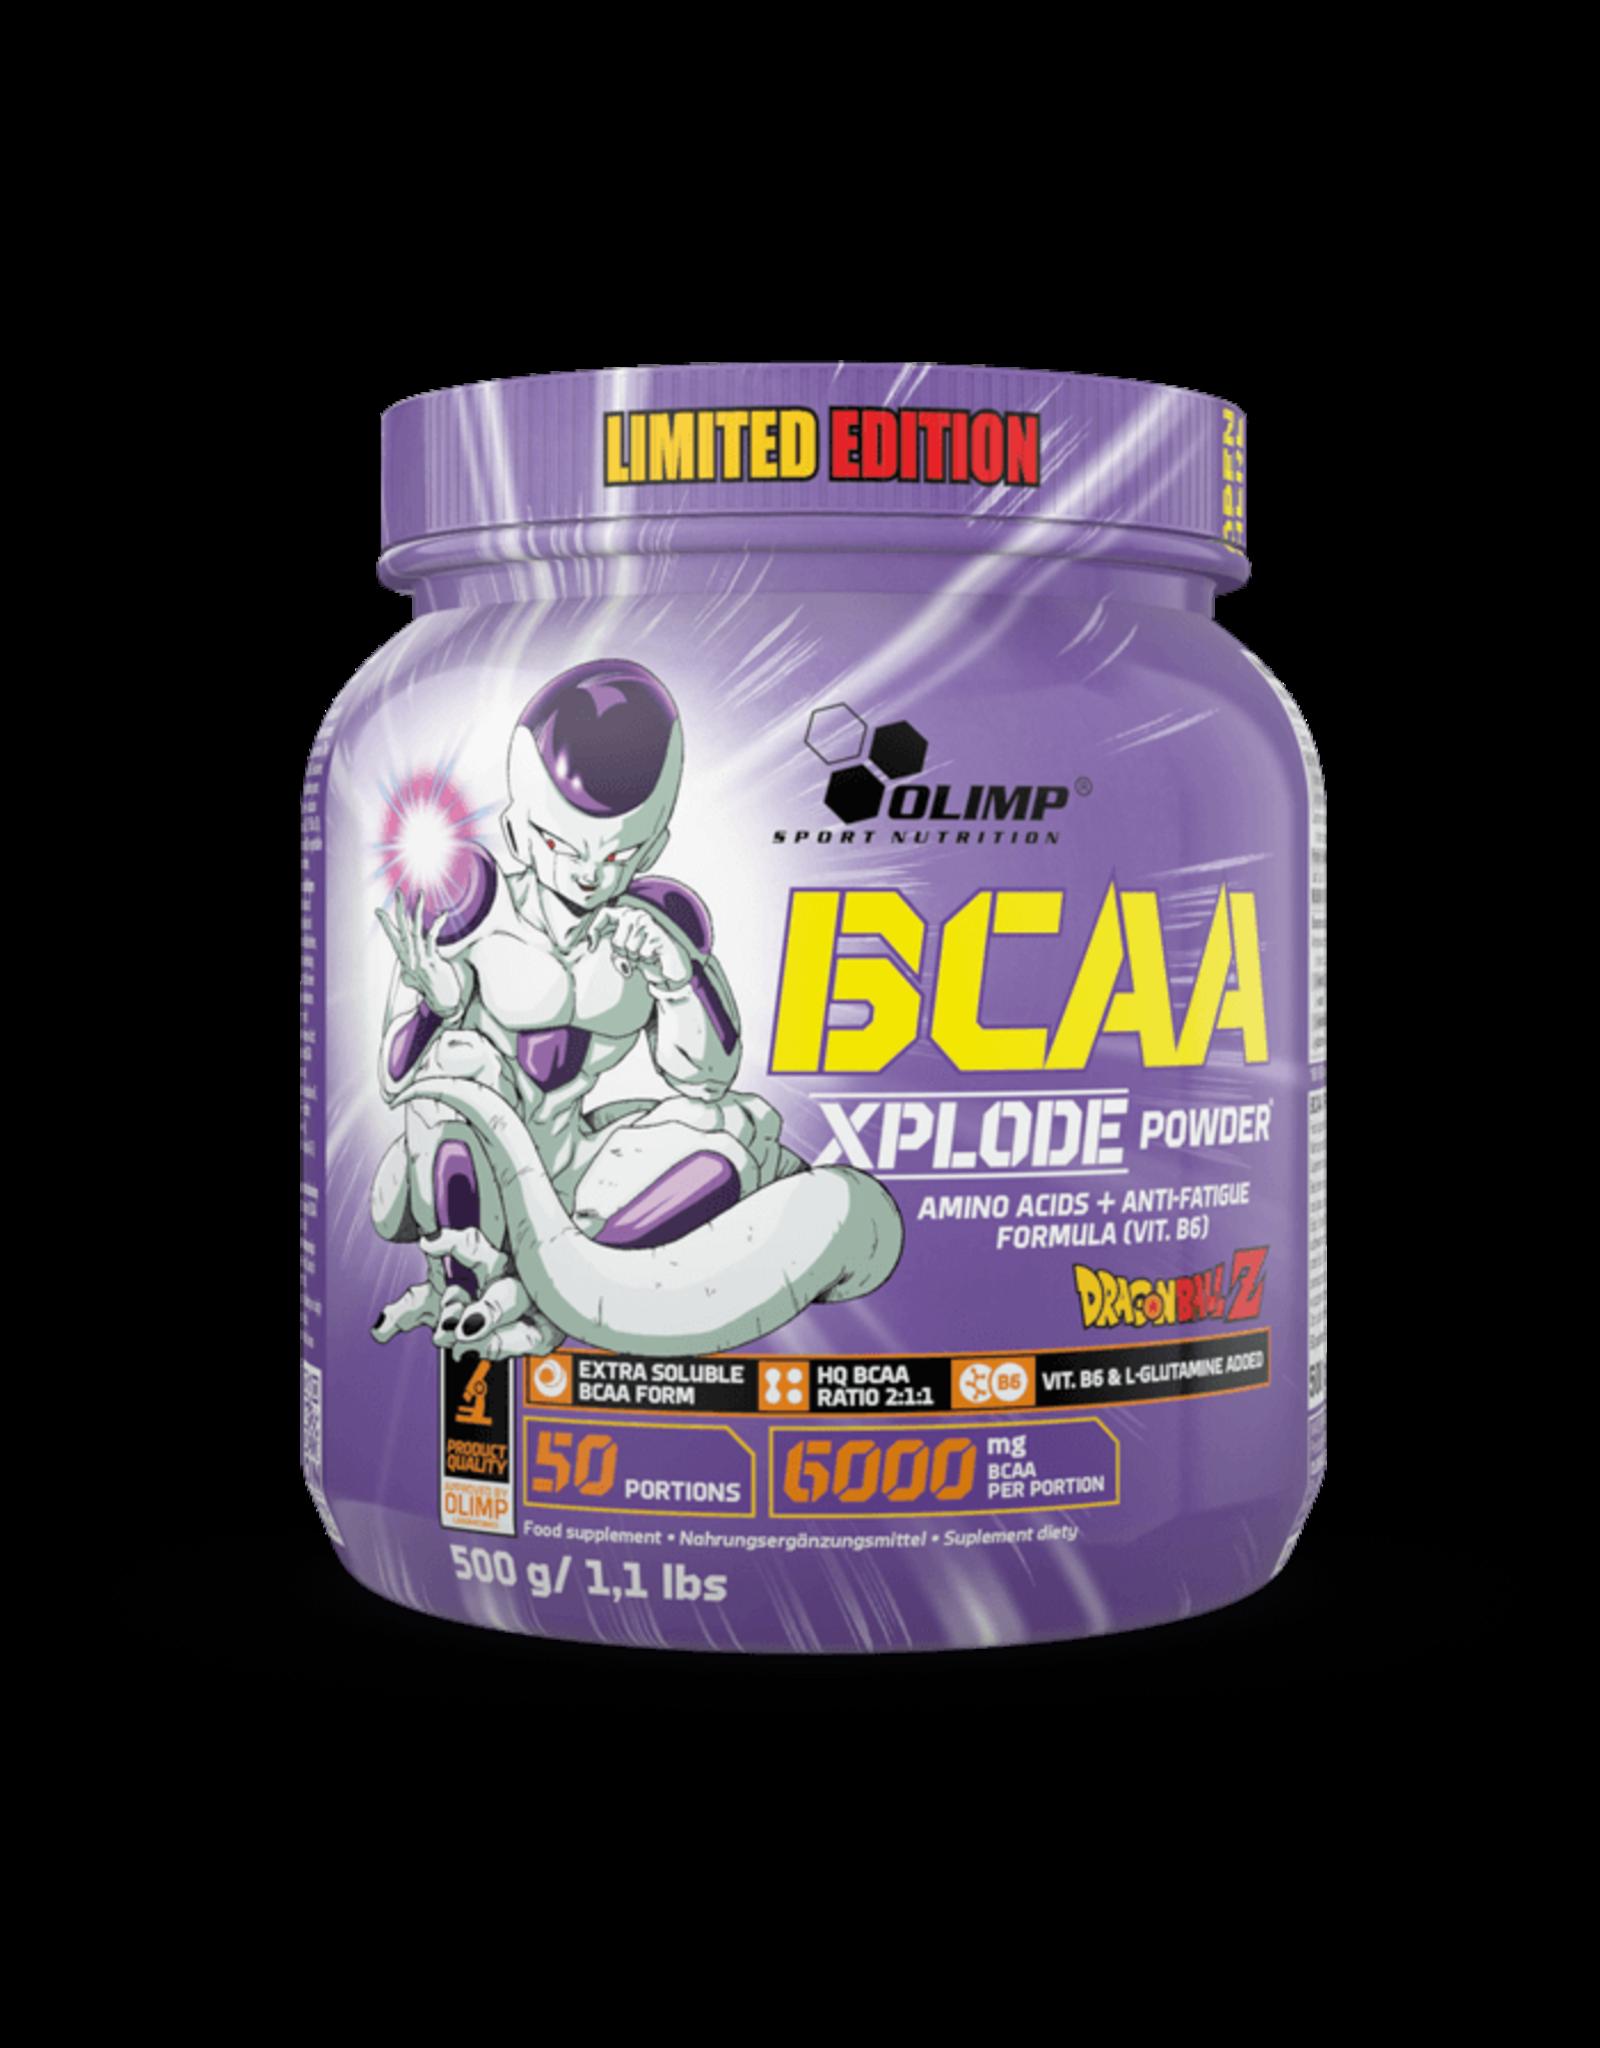 Olimp Nutrition BCAA Xplode Limited Edition